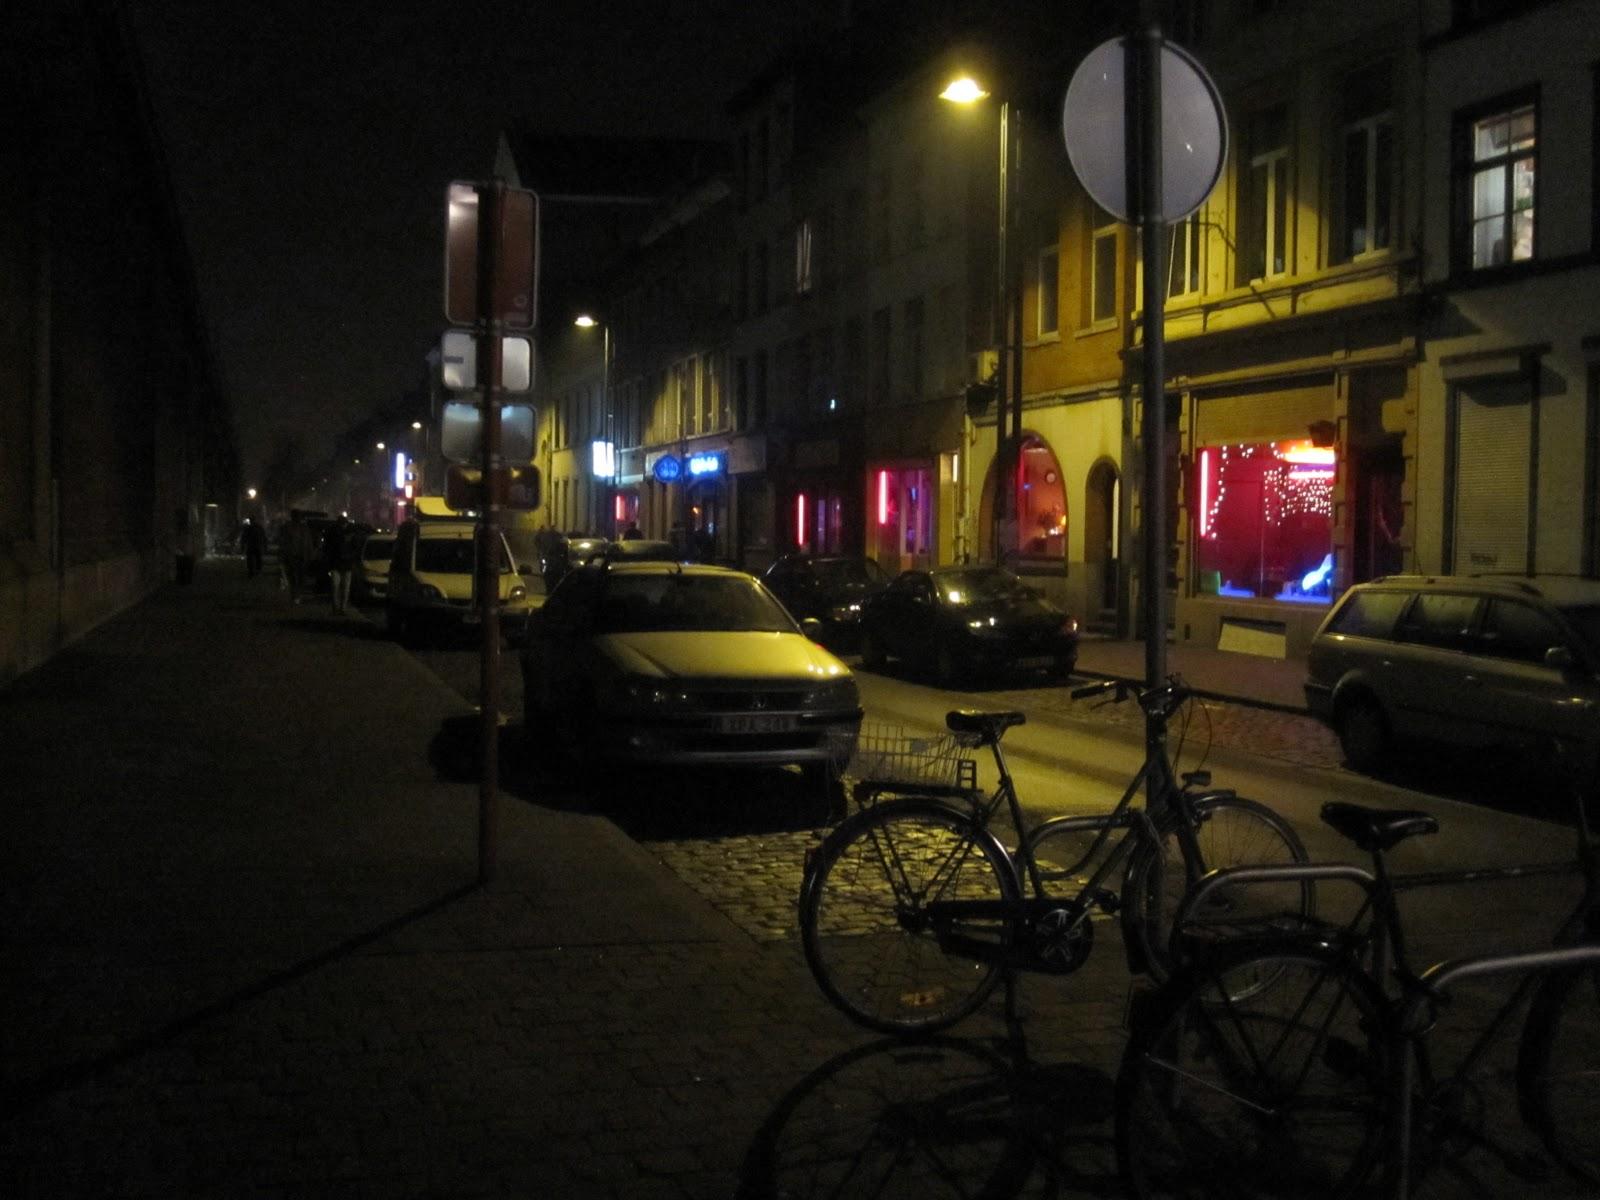 Like Antwerpen and Amsterdam, ...